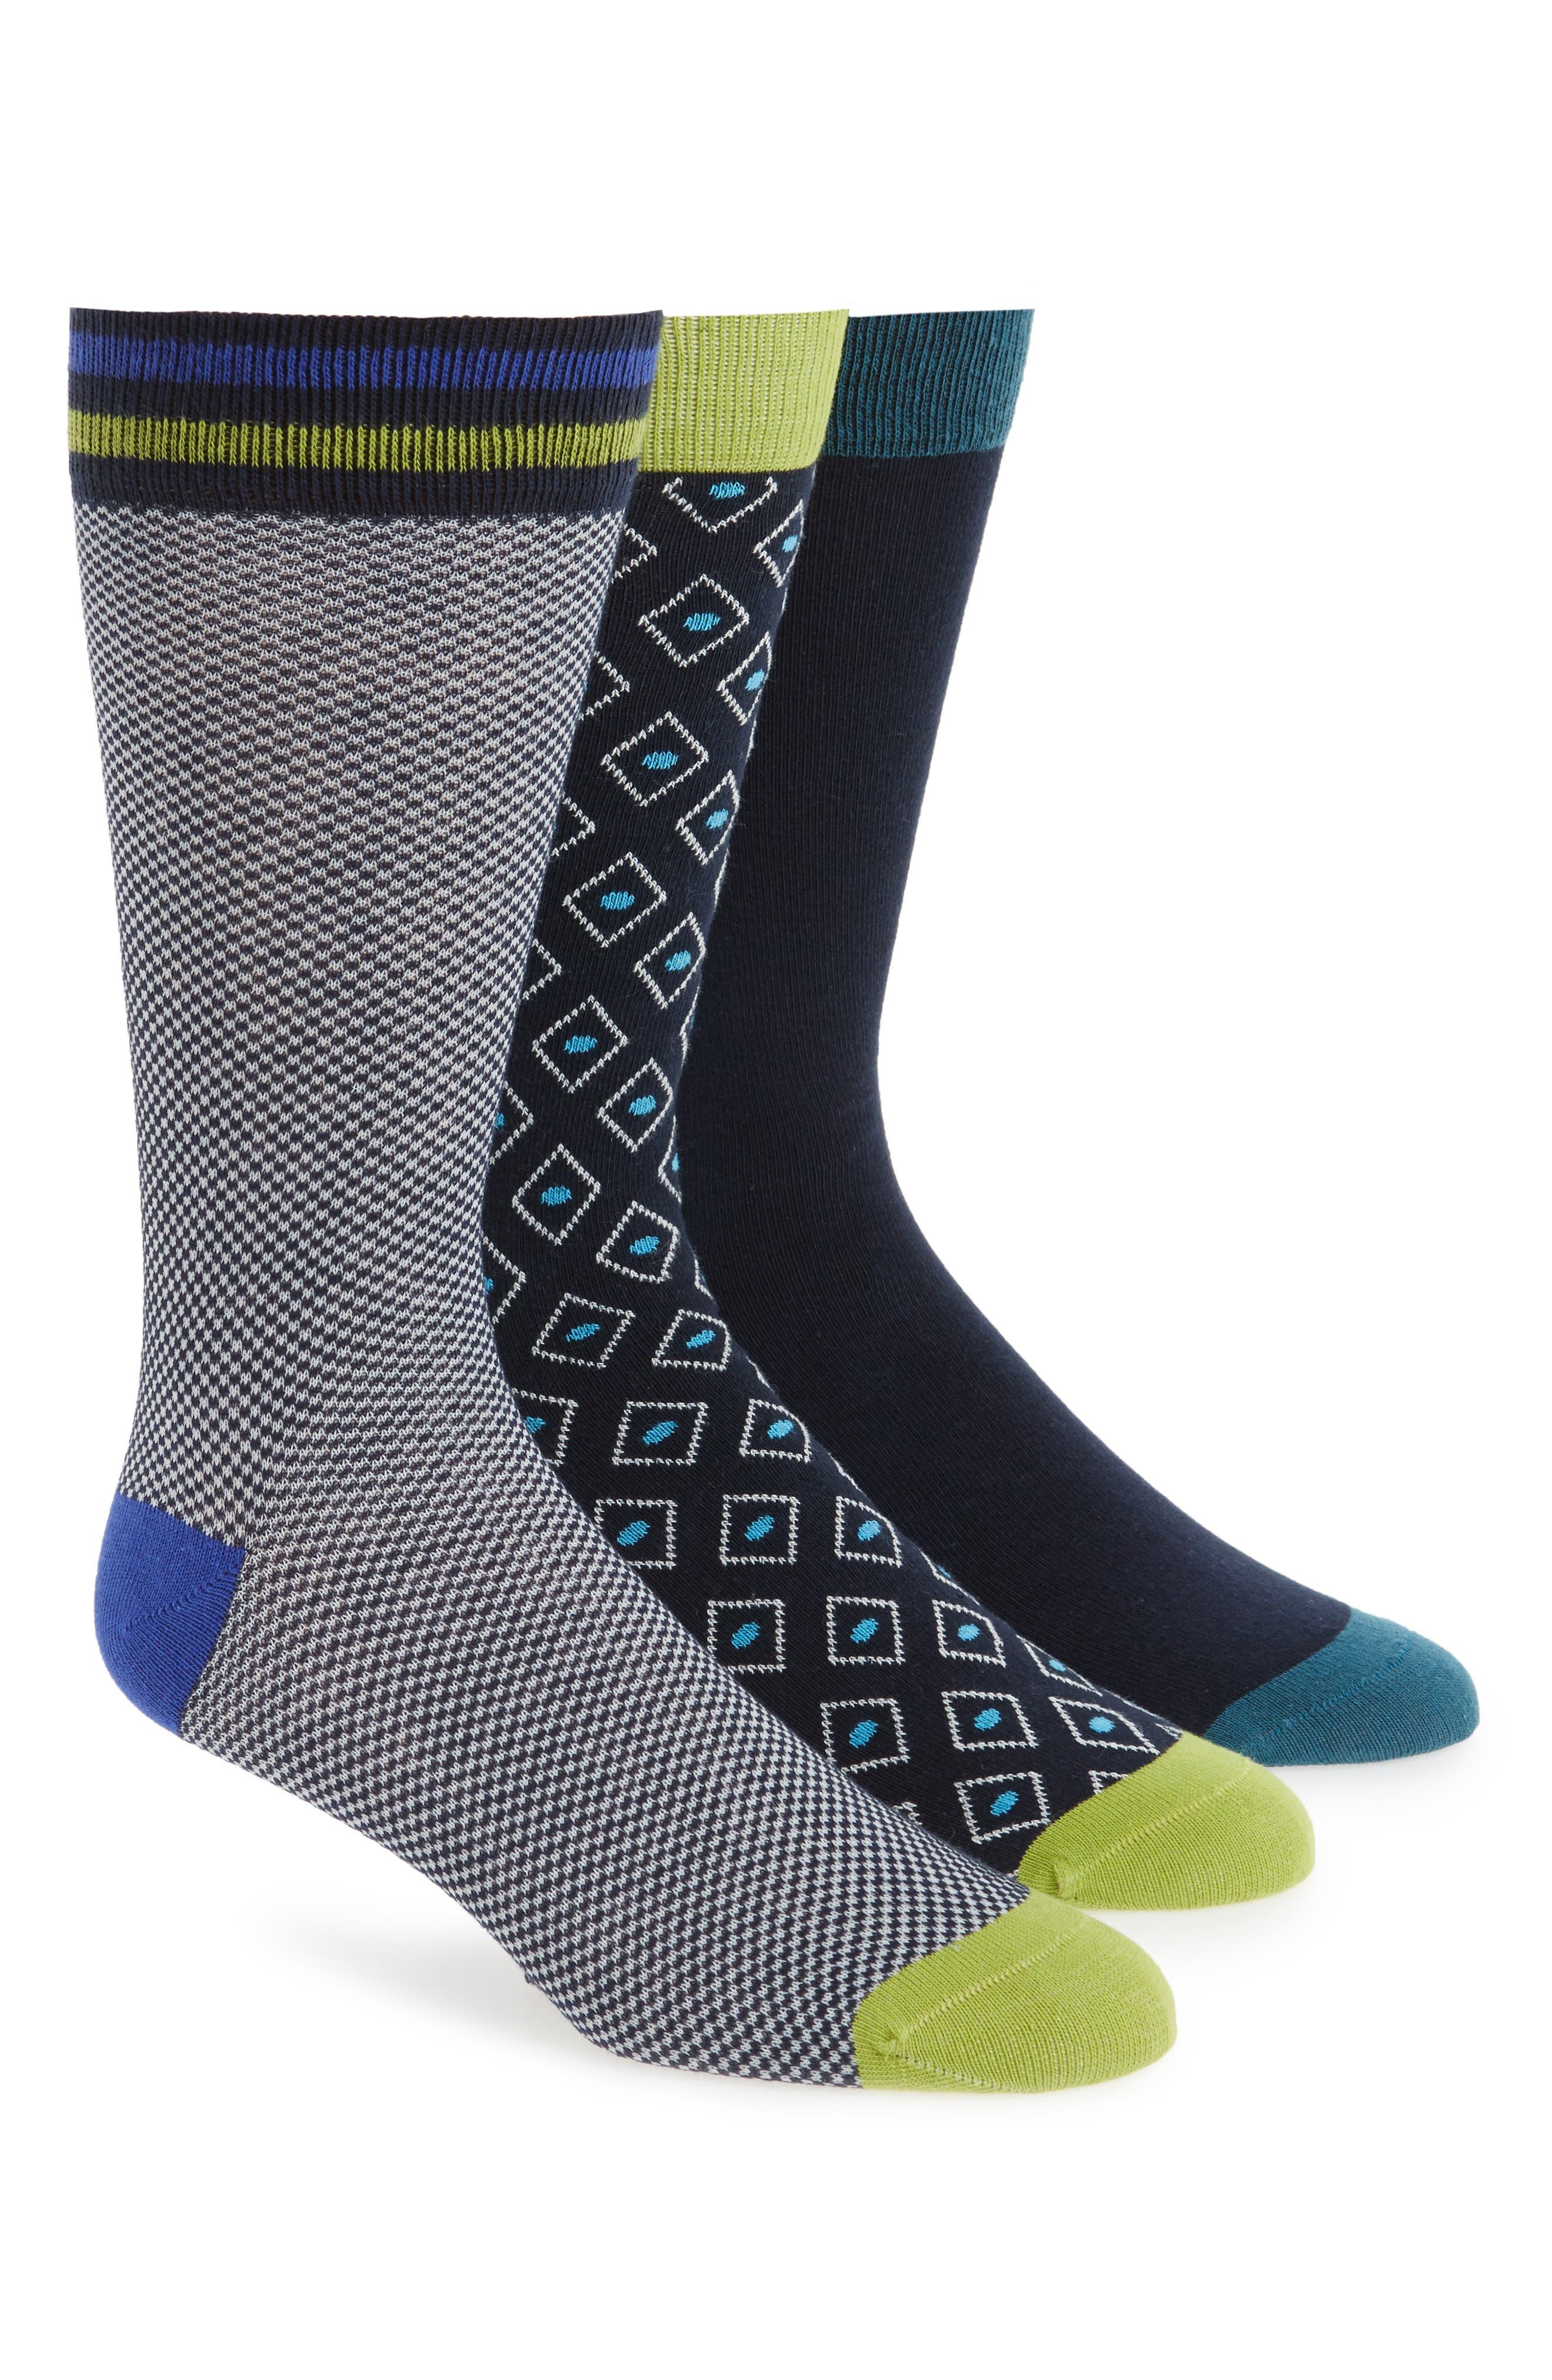 3-Pack Socks,                             Main thumbnail 1, color,                             Blue Assorted